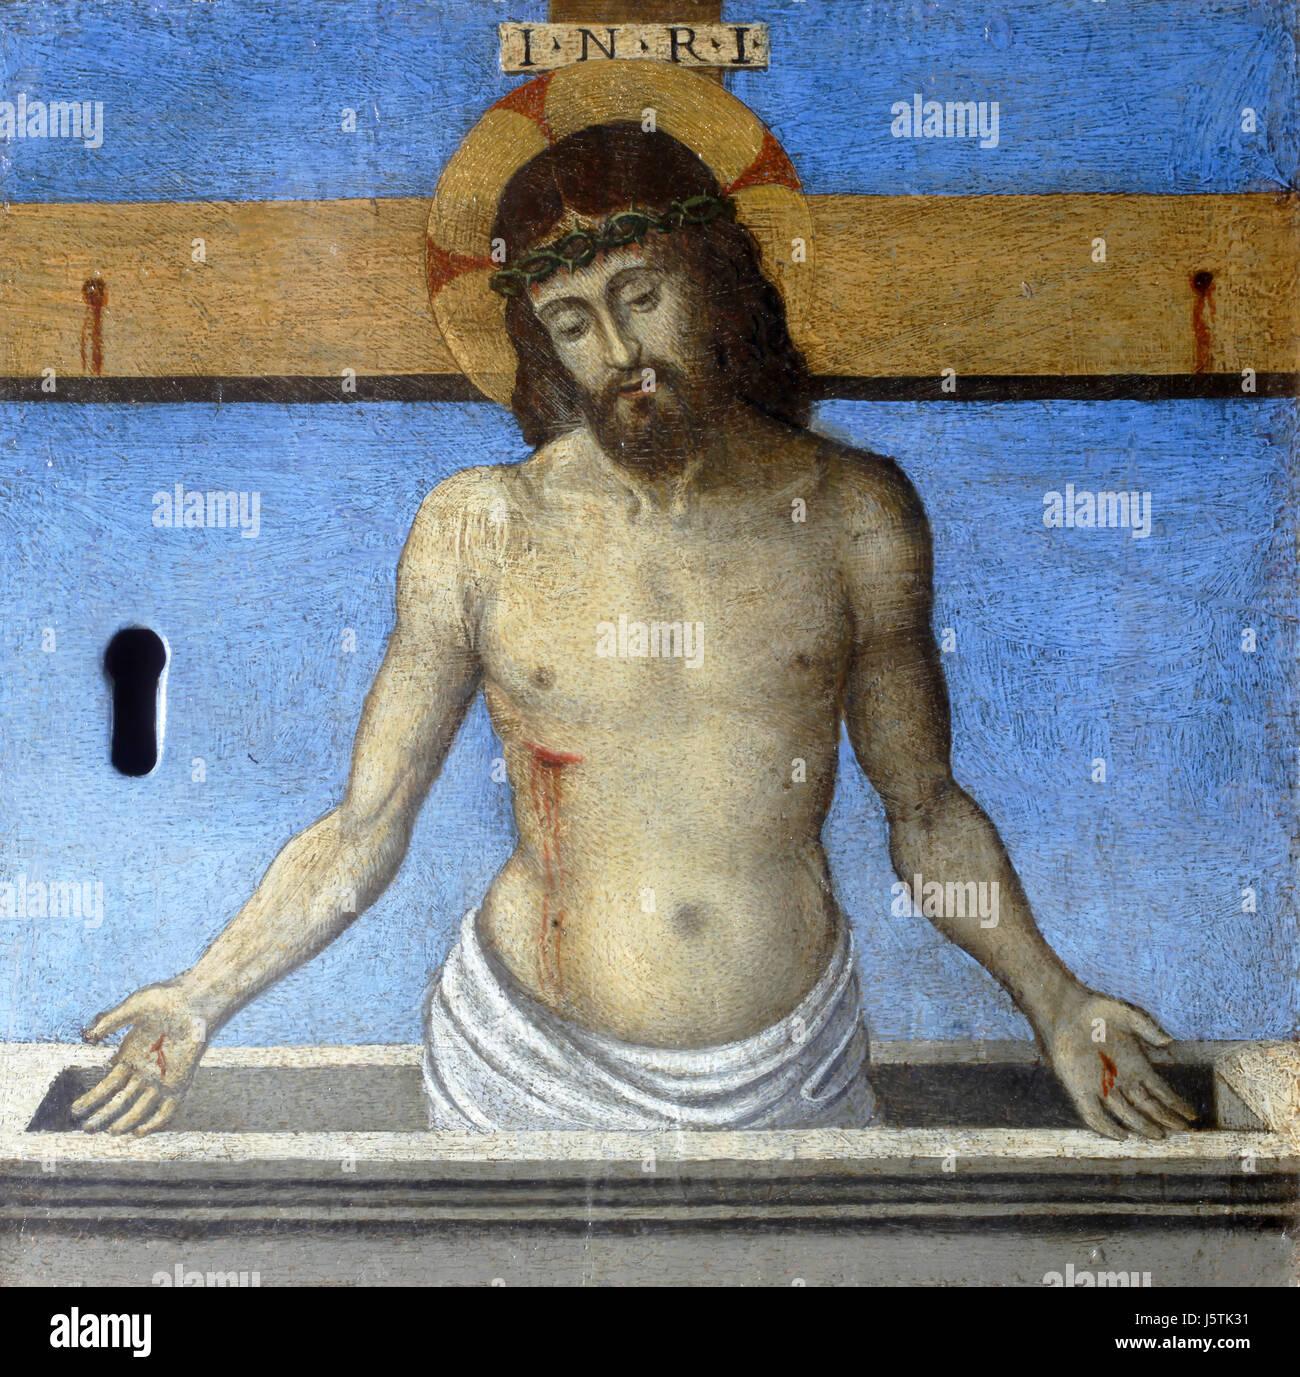 Girolamo da Santa Croce: Imago Pietatis Photo Stock